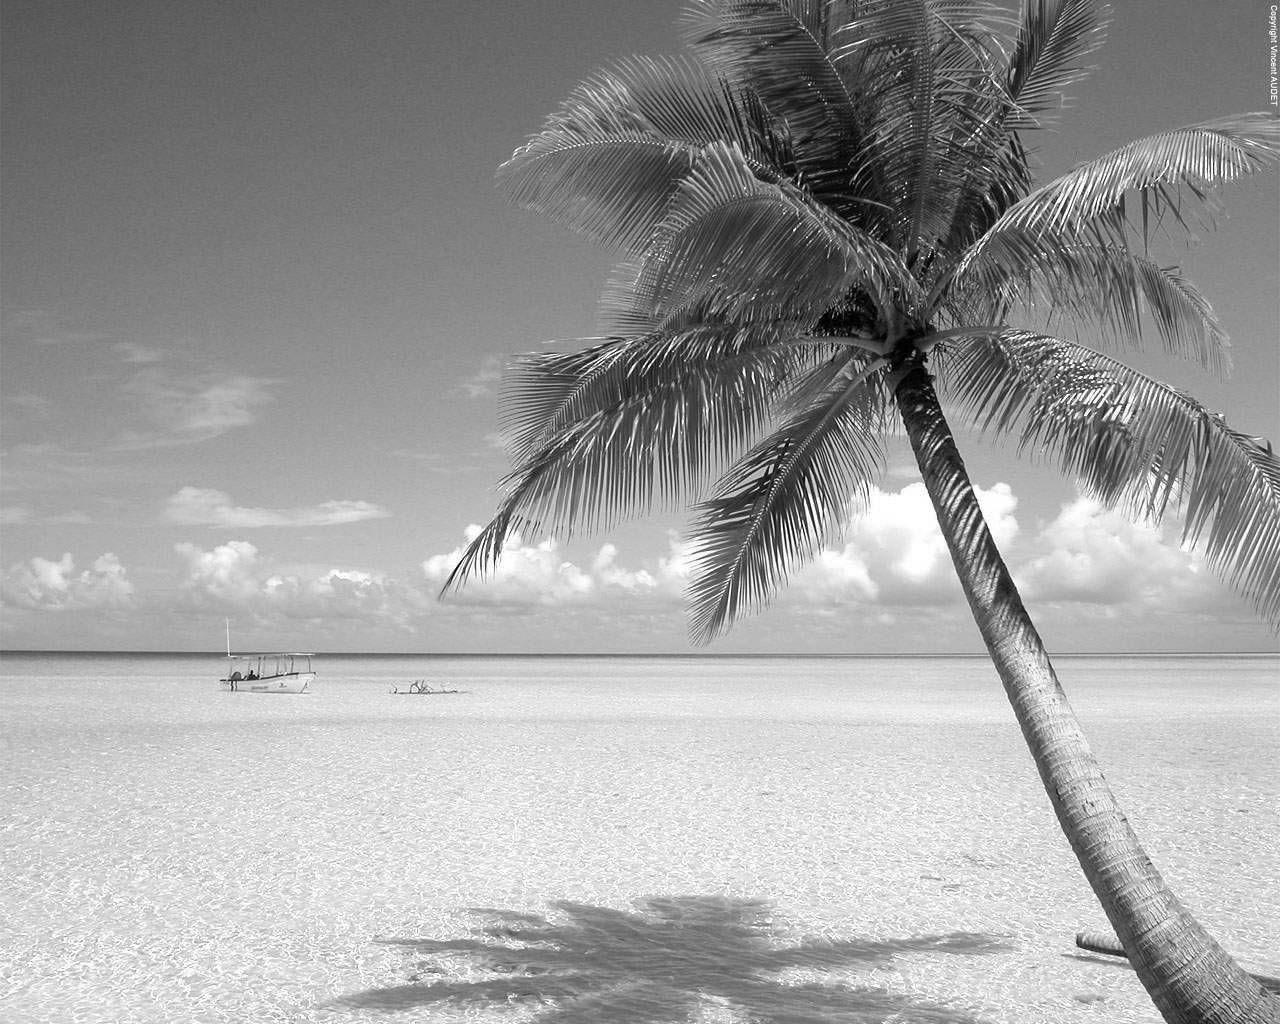 Black White Beach Picture Beaches World Landscape Wallpaper Hd 2814